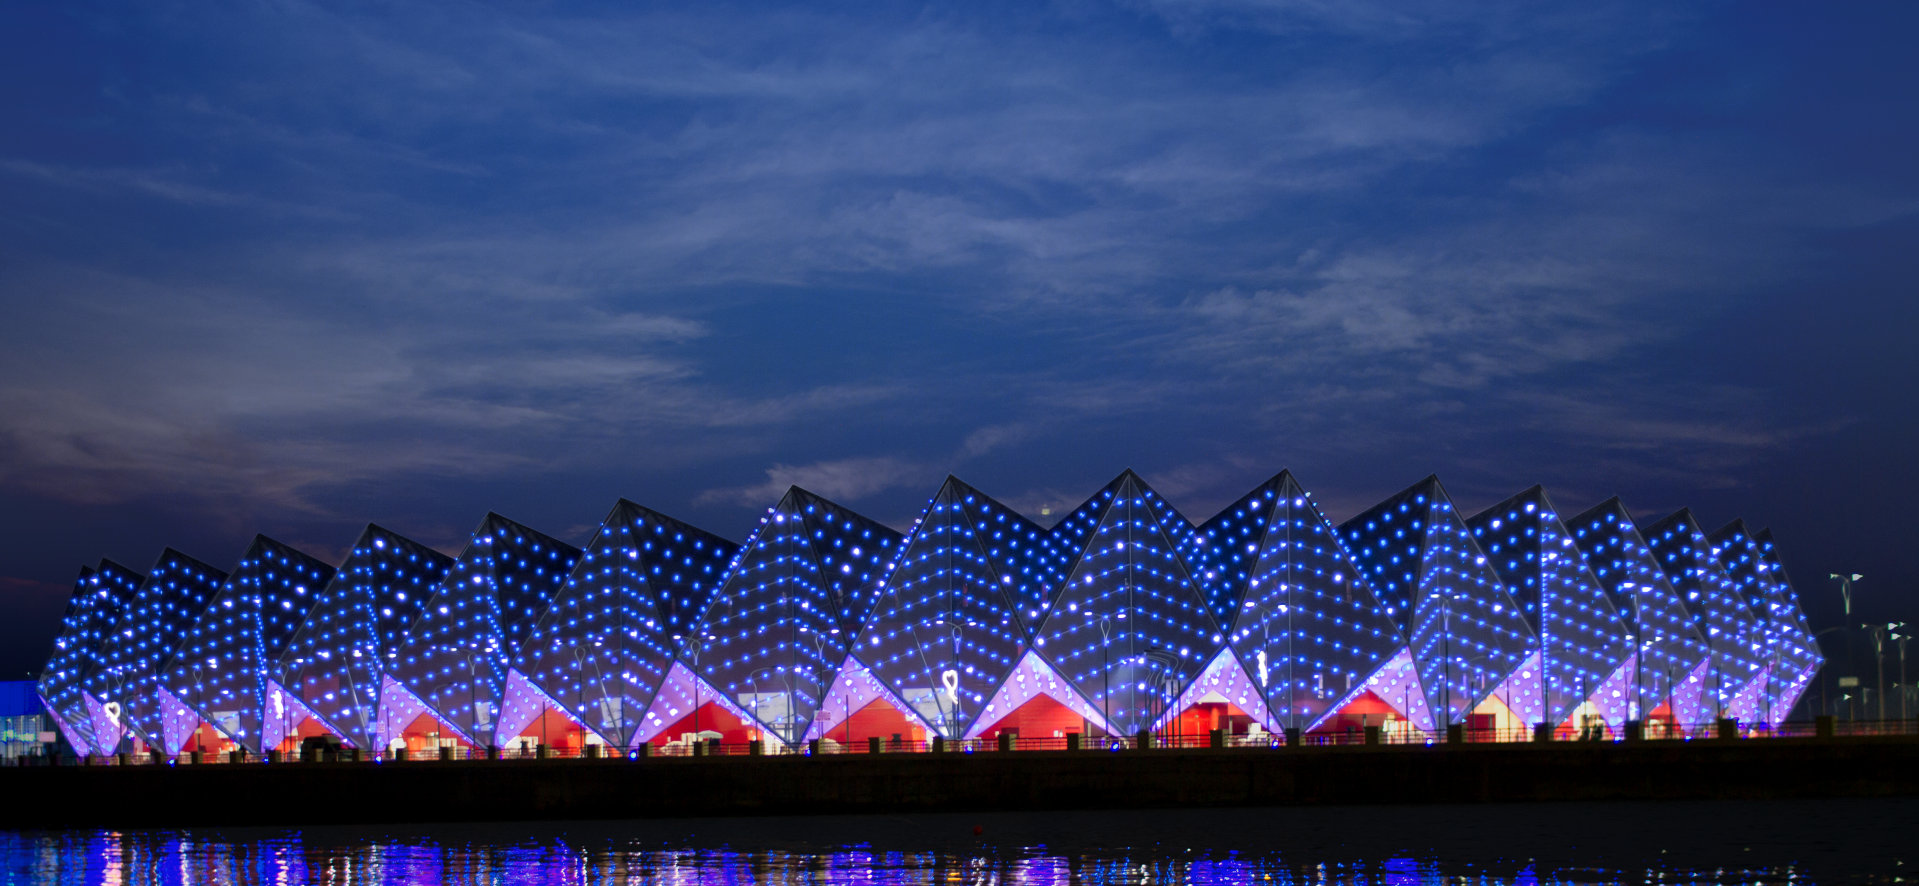 Beleuchtungslösungen für Sportstätten